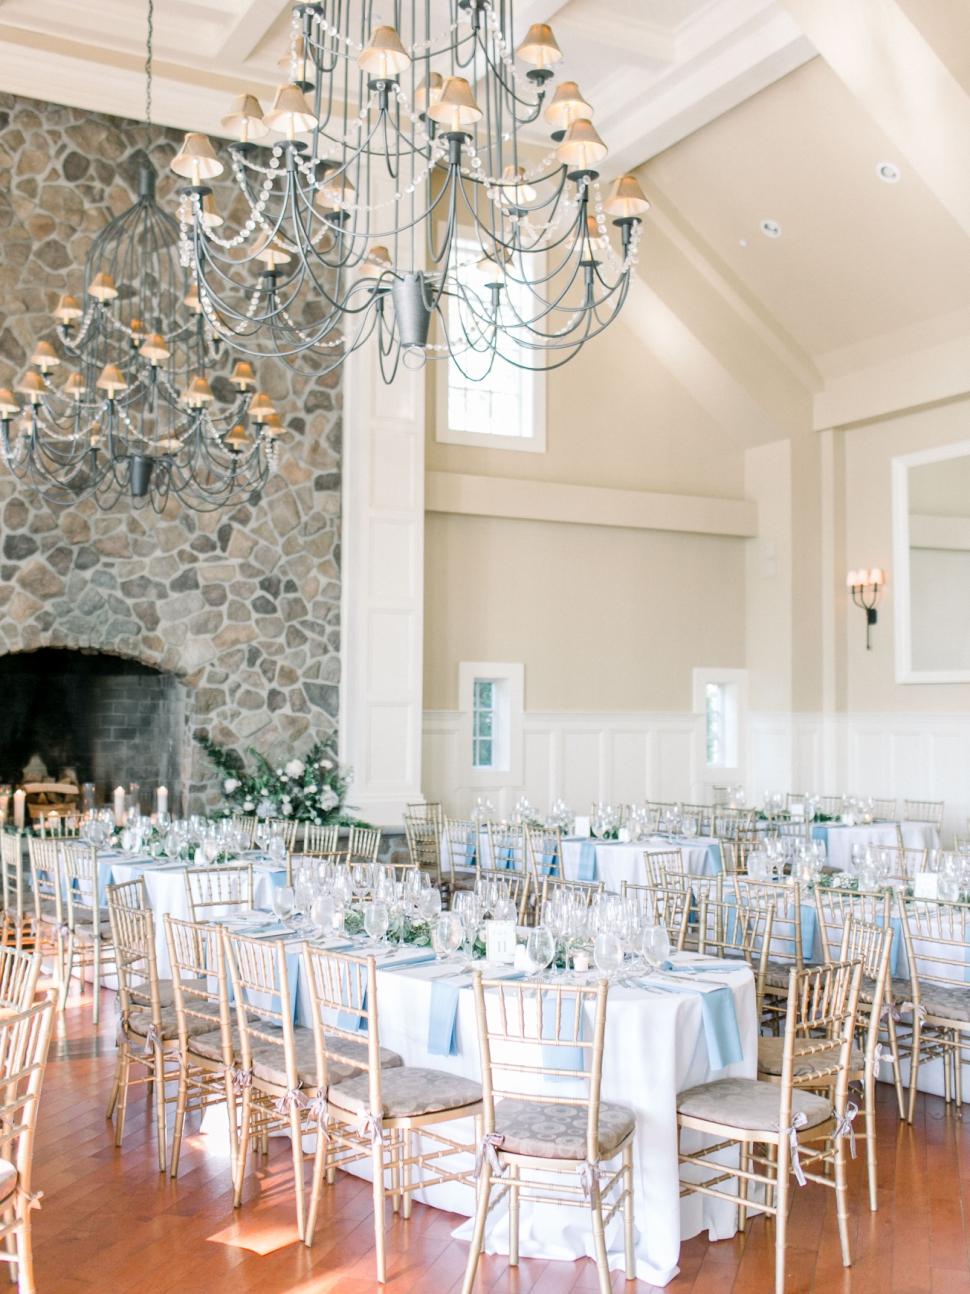 Ryland-Inn-Wedding-Photographer-Cassi-Claire_Ryland-Inn-Wedding_36.jpg